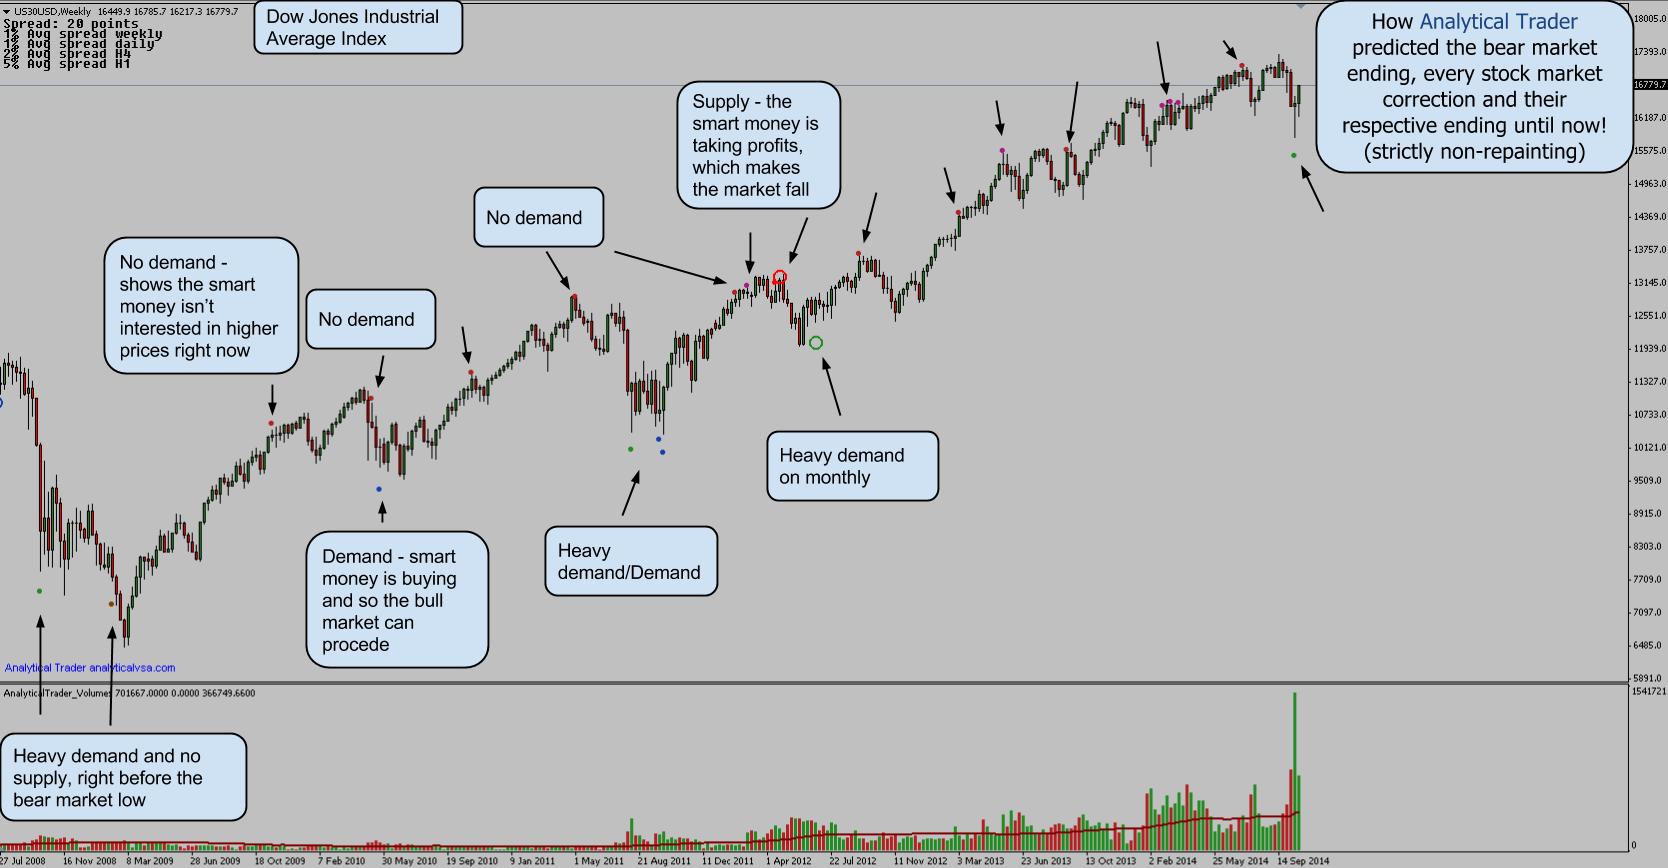 predicting stock market acti - HD1668×868